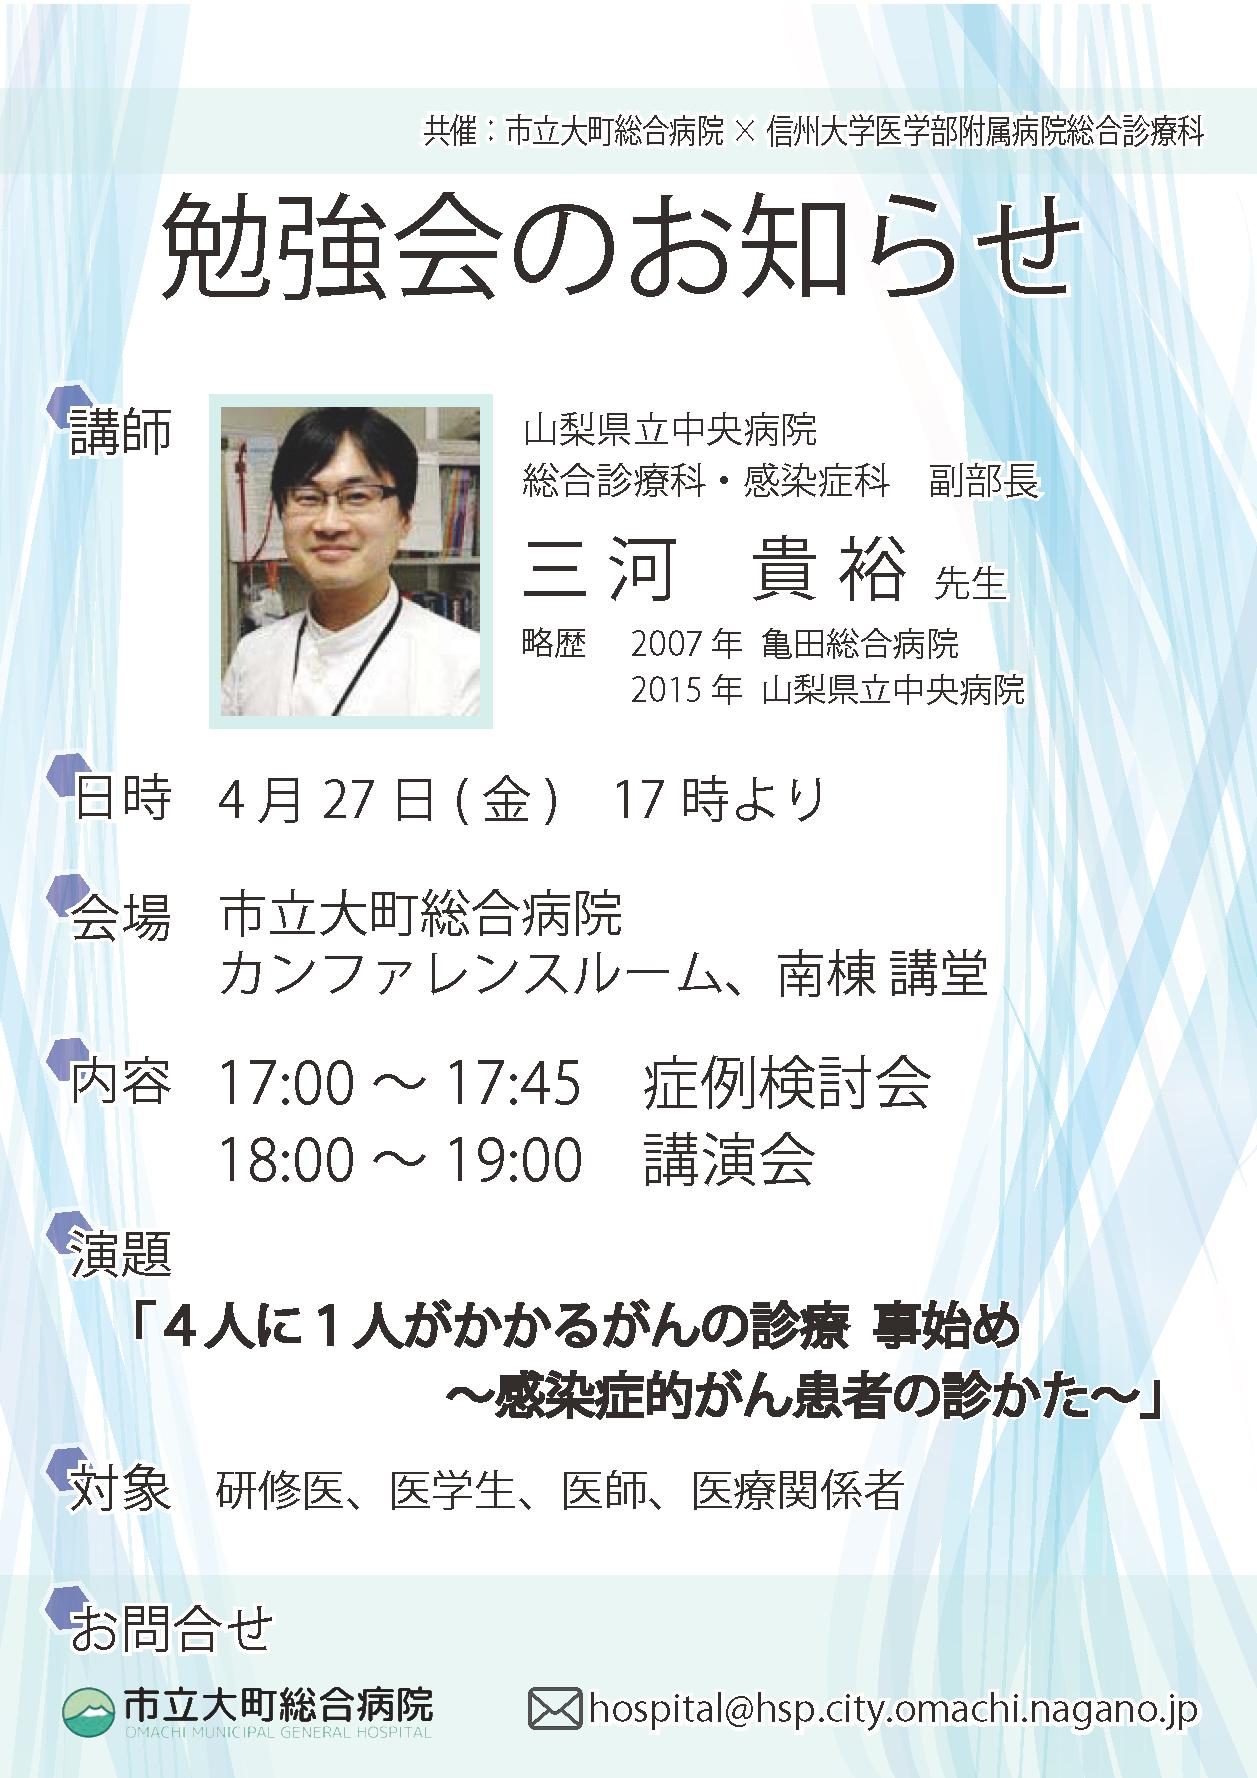 H30.4.27 三河Dr勉強会ポスター(院外).png